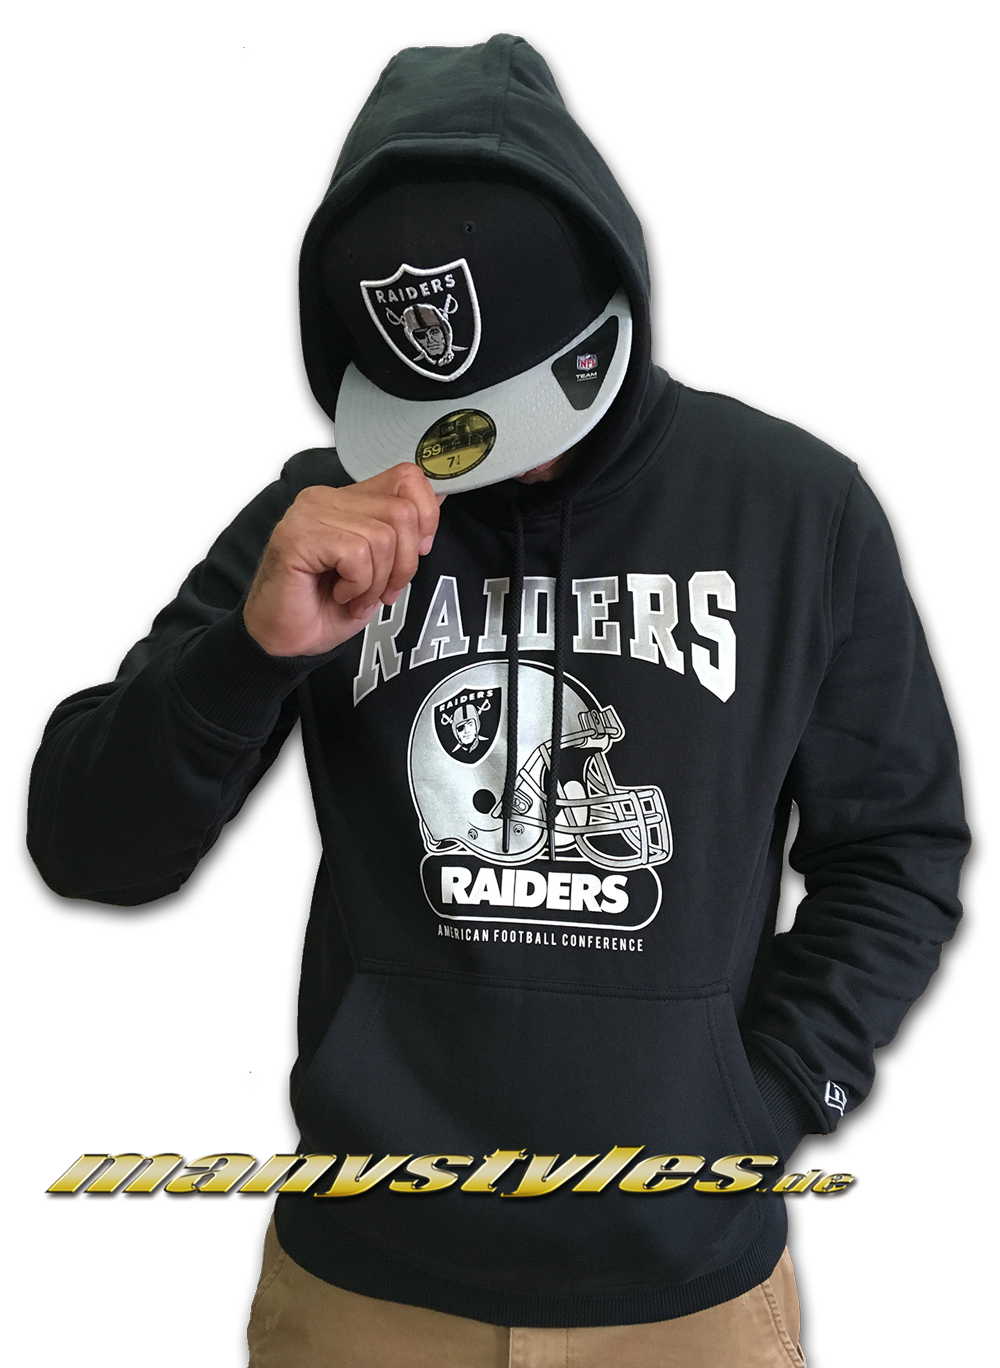 488c8352edc New Era. Vorschau  Las Vegas Raiders oder OaklandrRaiders NFL Team Archie  Hoodie Hooded Sweater Black Team Color ...